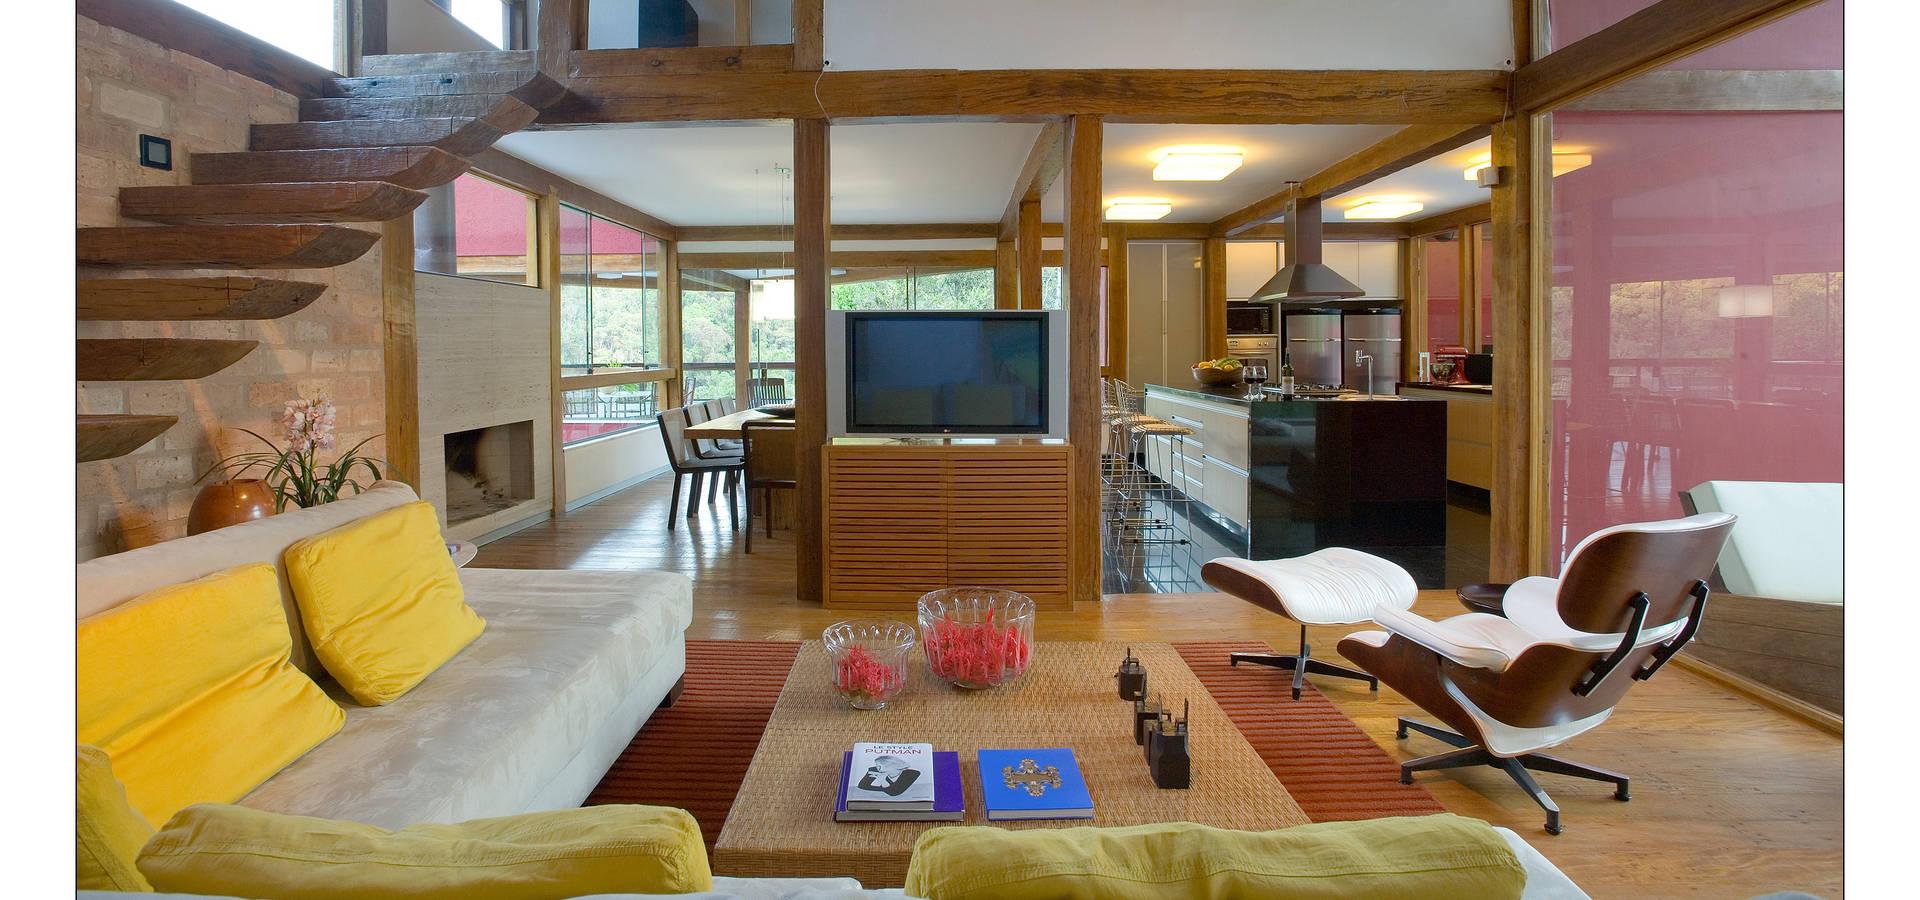 David Guerra Arquitetura e Interiores